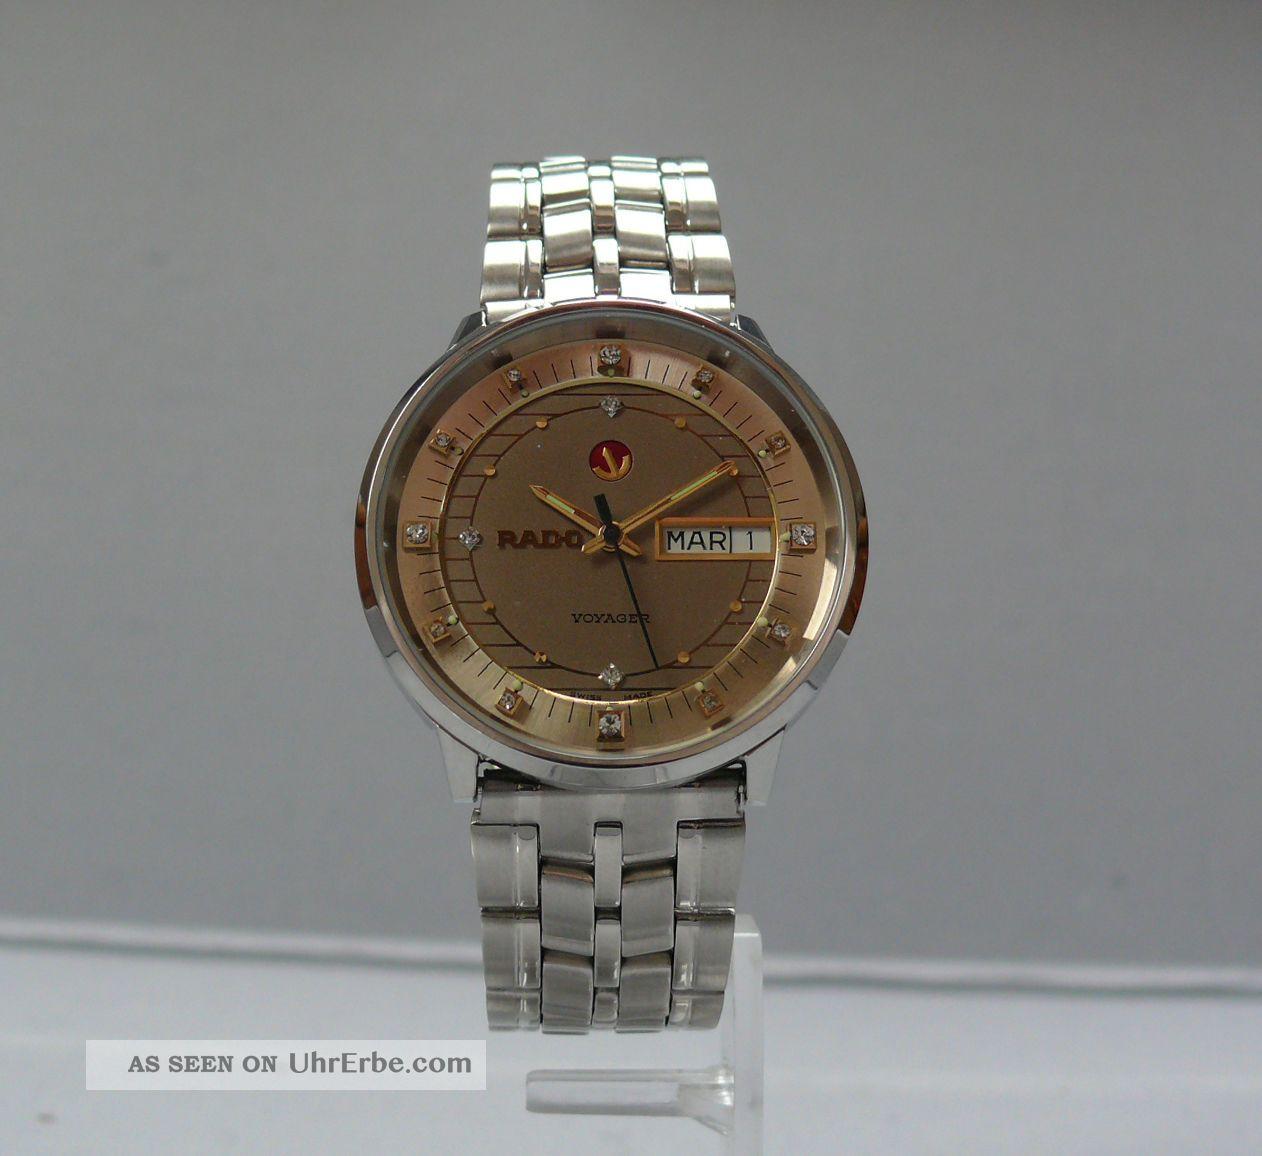 Rado Voyager Automatic 1970´er Jahre (11.  72 - 464) Armbanduhren Bild